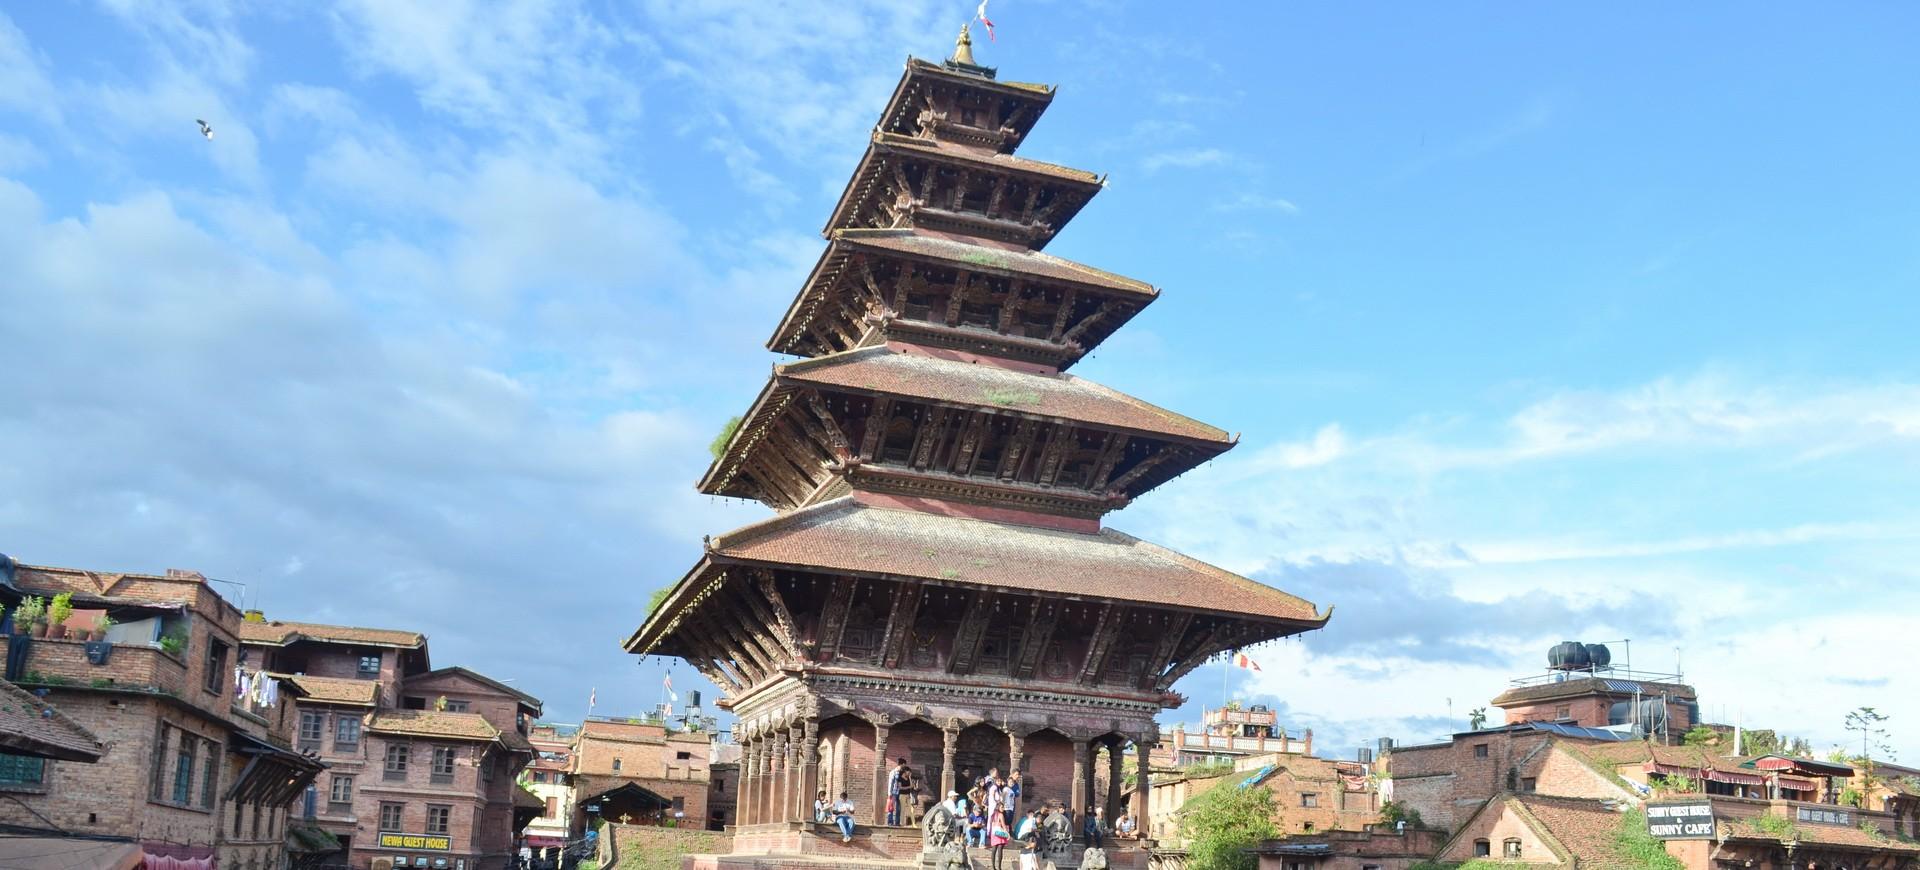 Népal Bhadgaon ou Bhaktapur